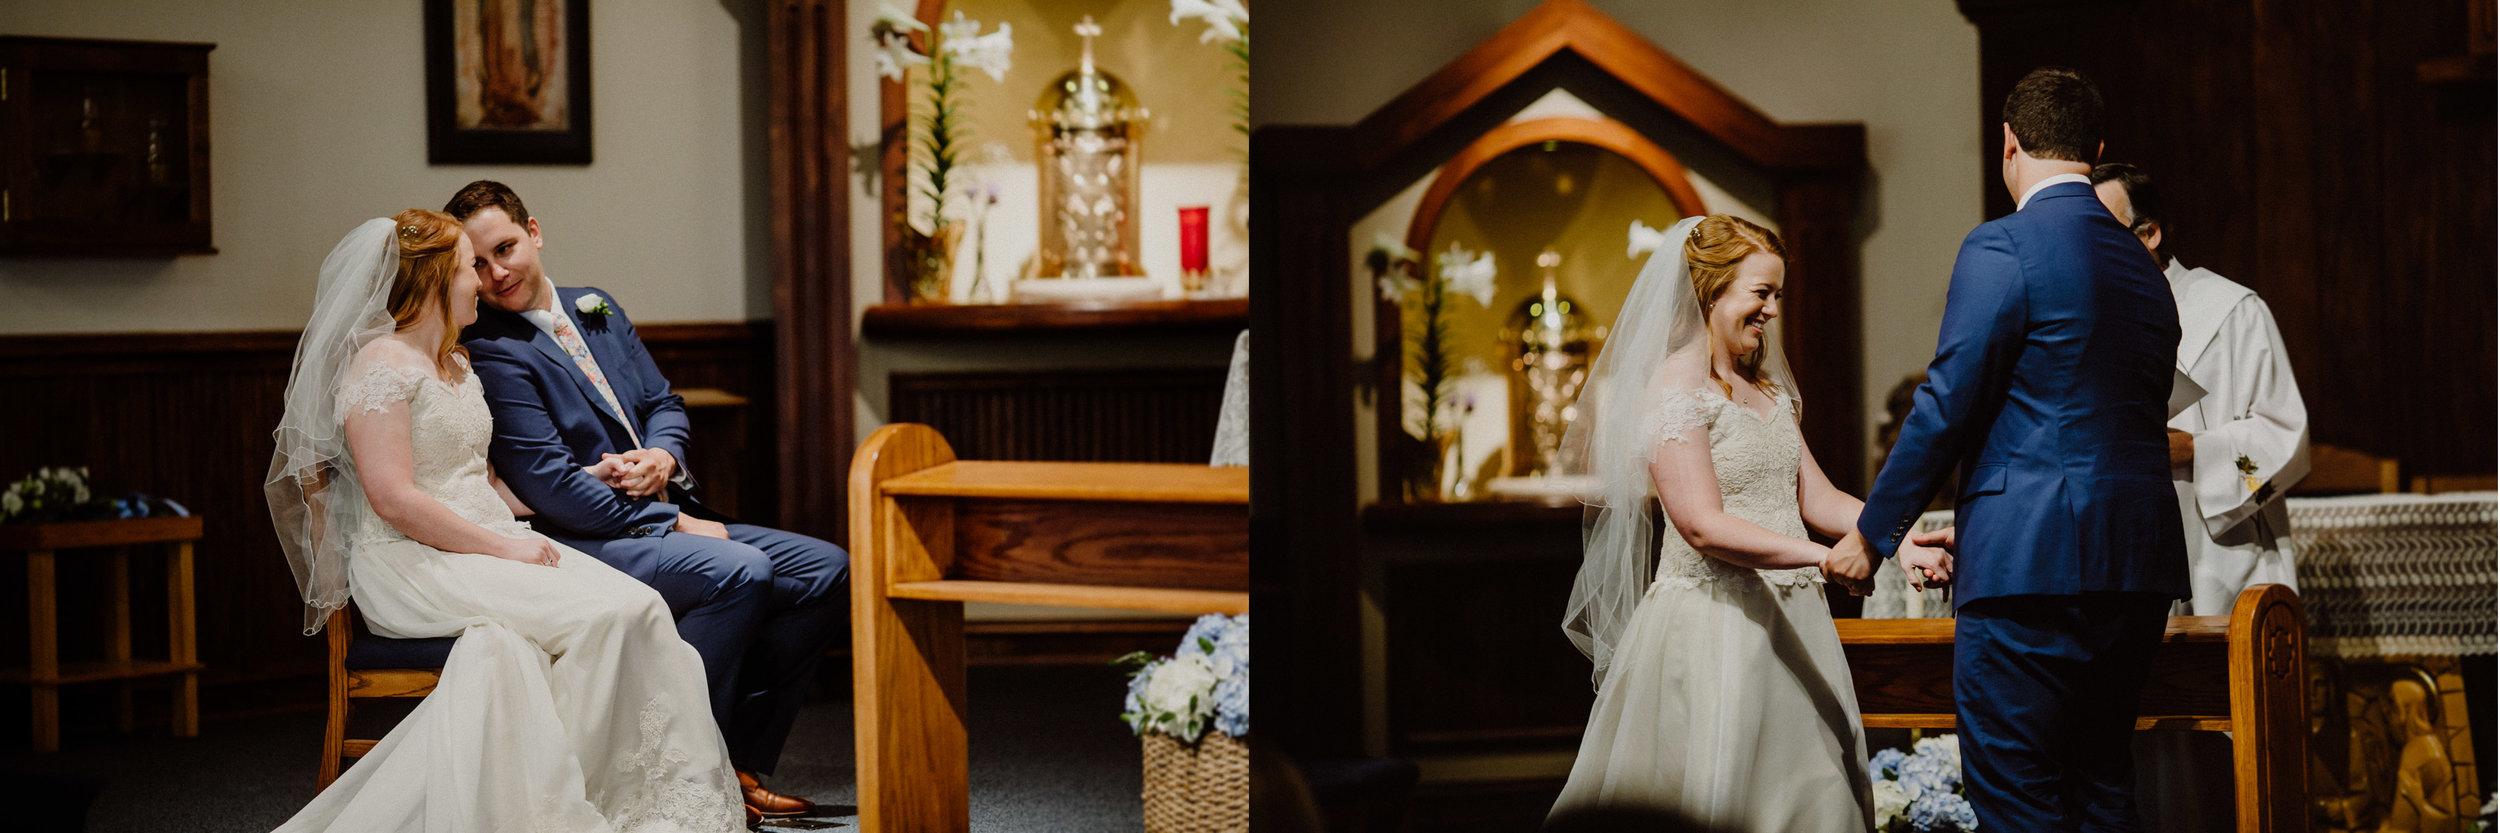 chapel-wedding2.jpg